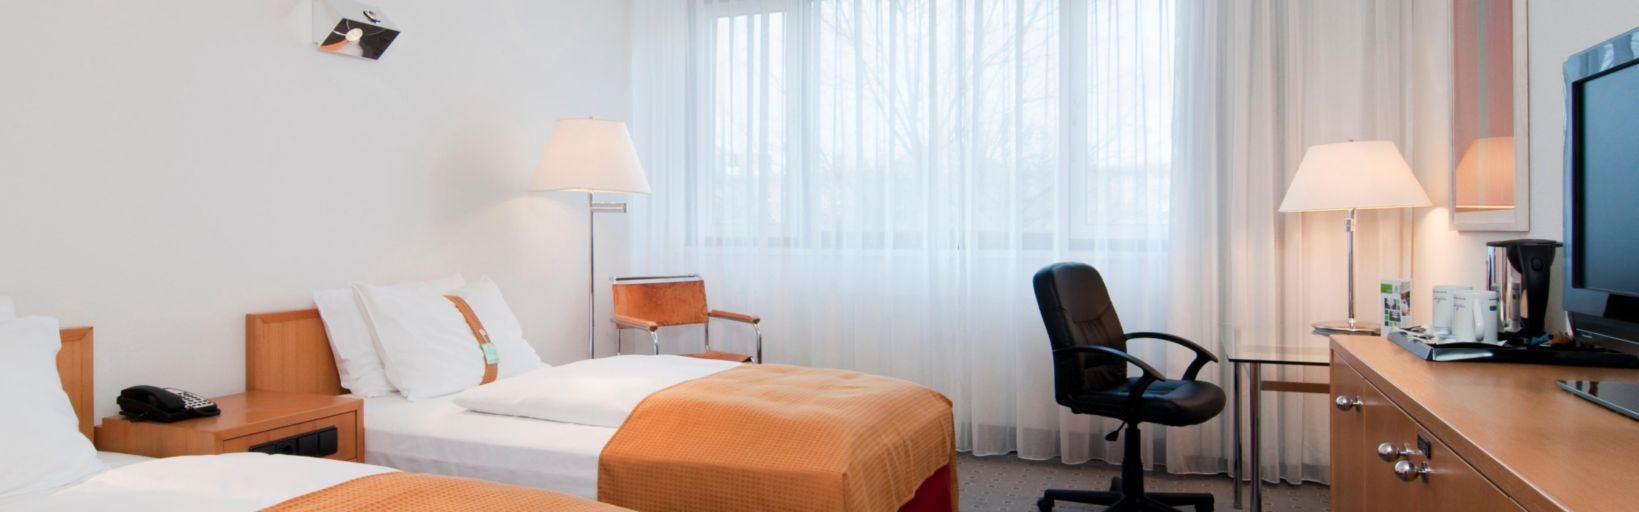 Siemens headquarter Hotel Flughafen Tegel - Holiday Inn Berlin ...